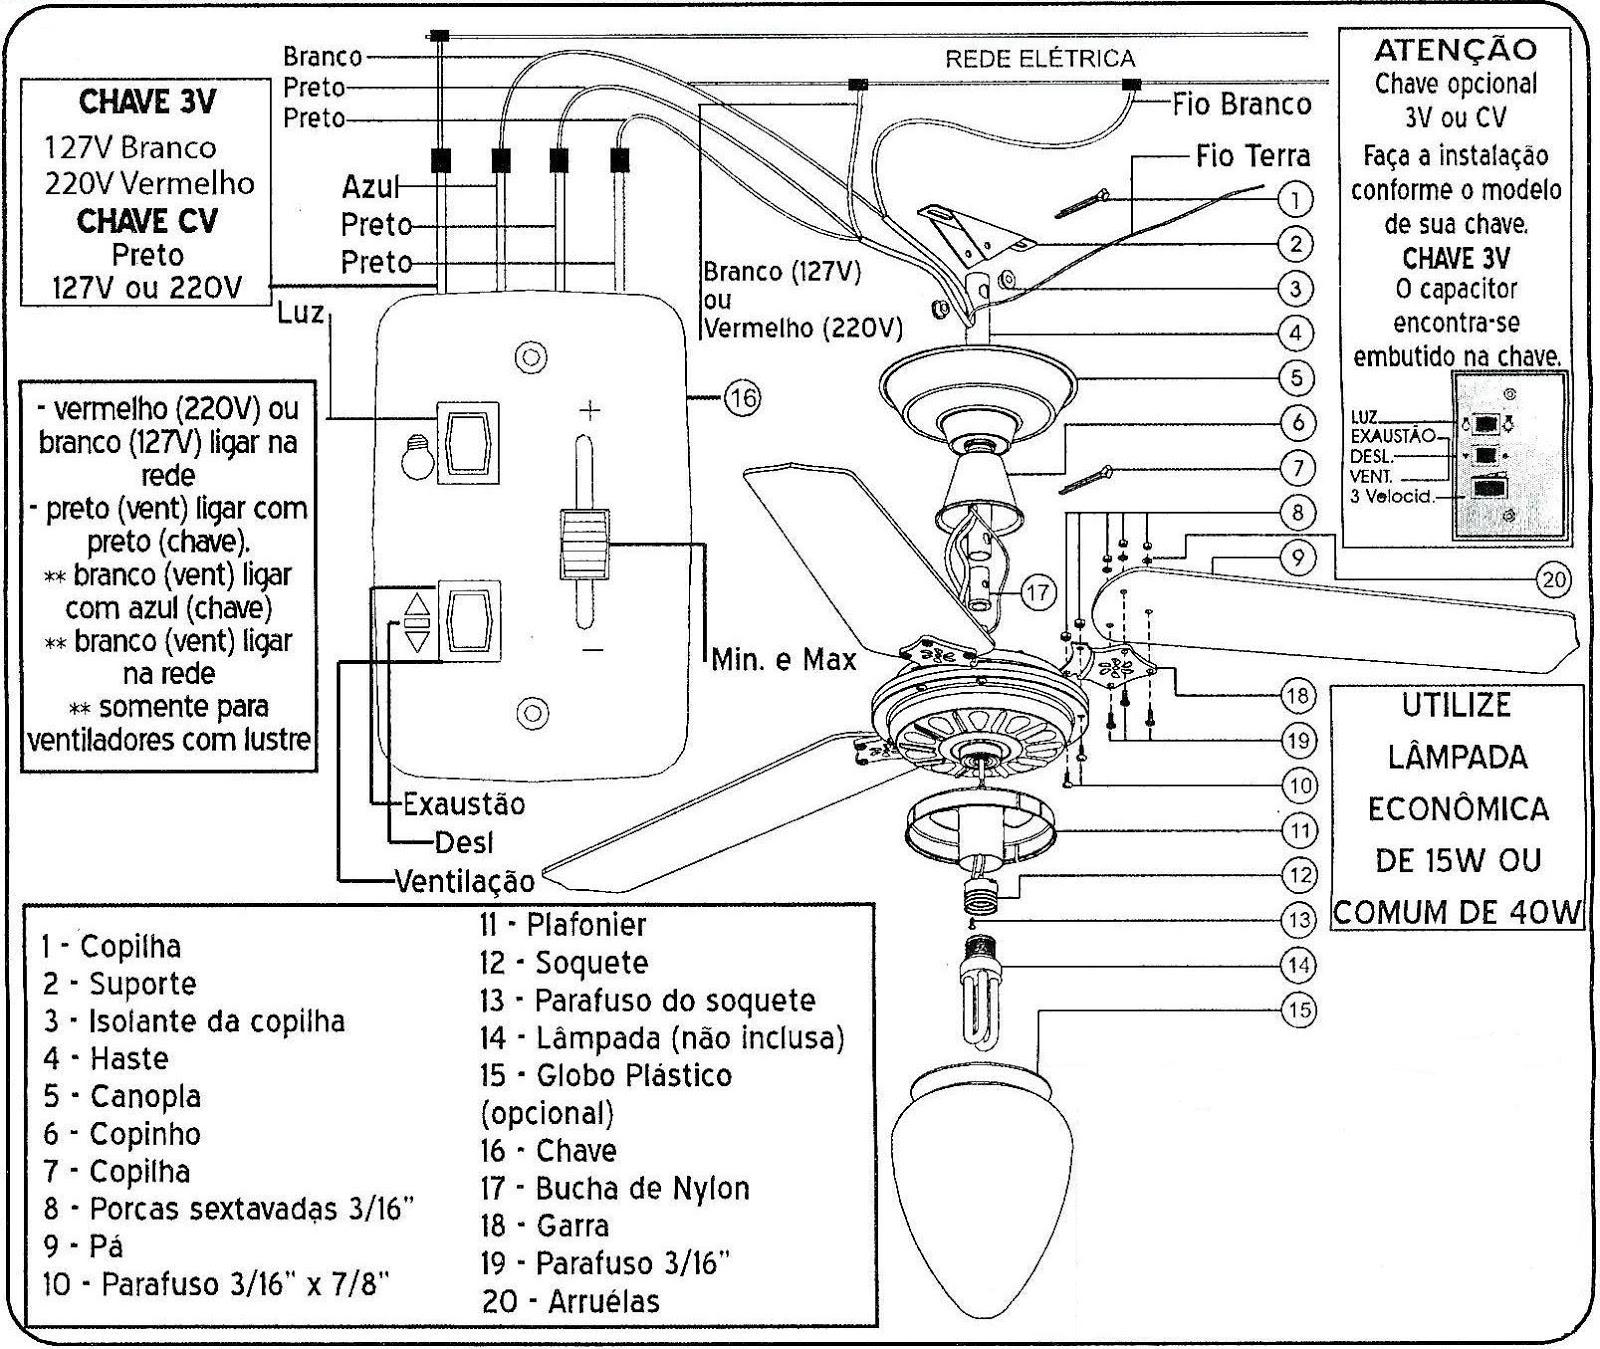 Manual Ventiladores Maynard: full version free software